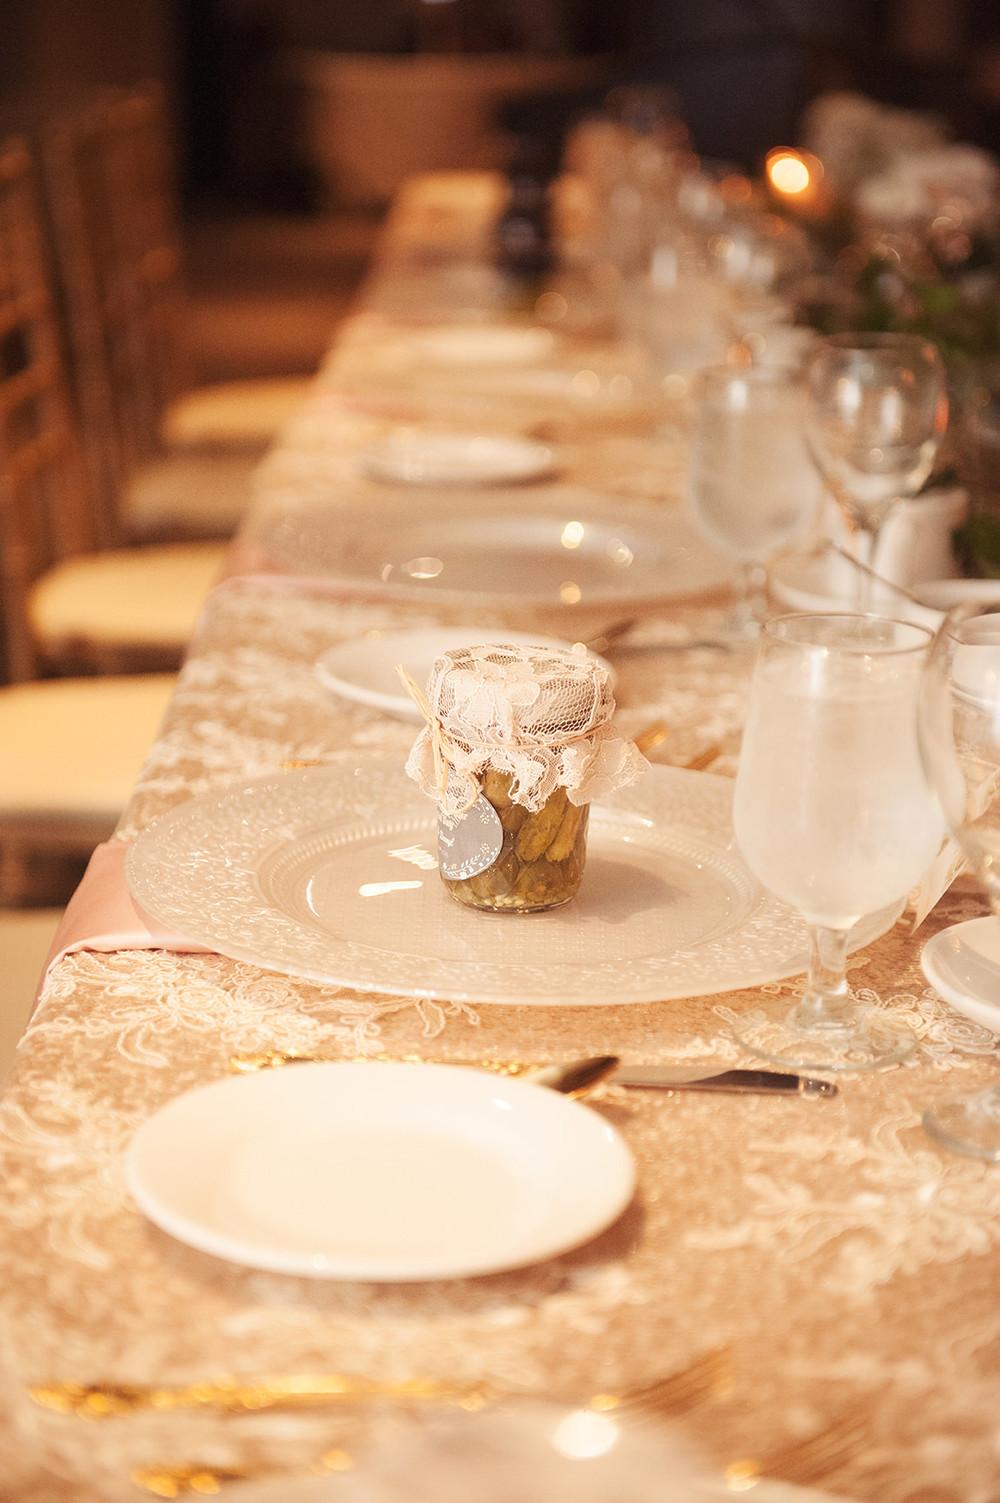 St-Catharines-Wedding-Stone-Mill-Inn-Amy-Darryl-photography-by-Morgan-Falk-068.JPG